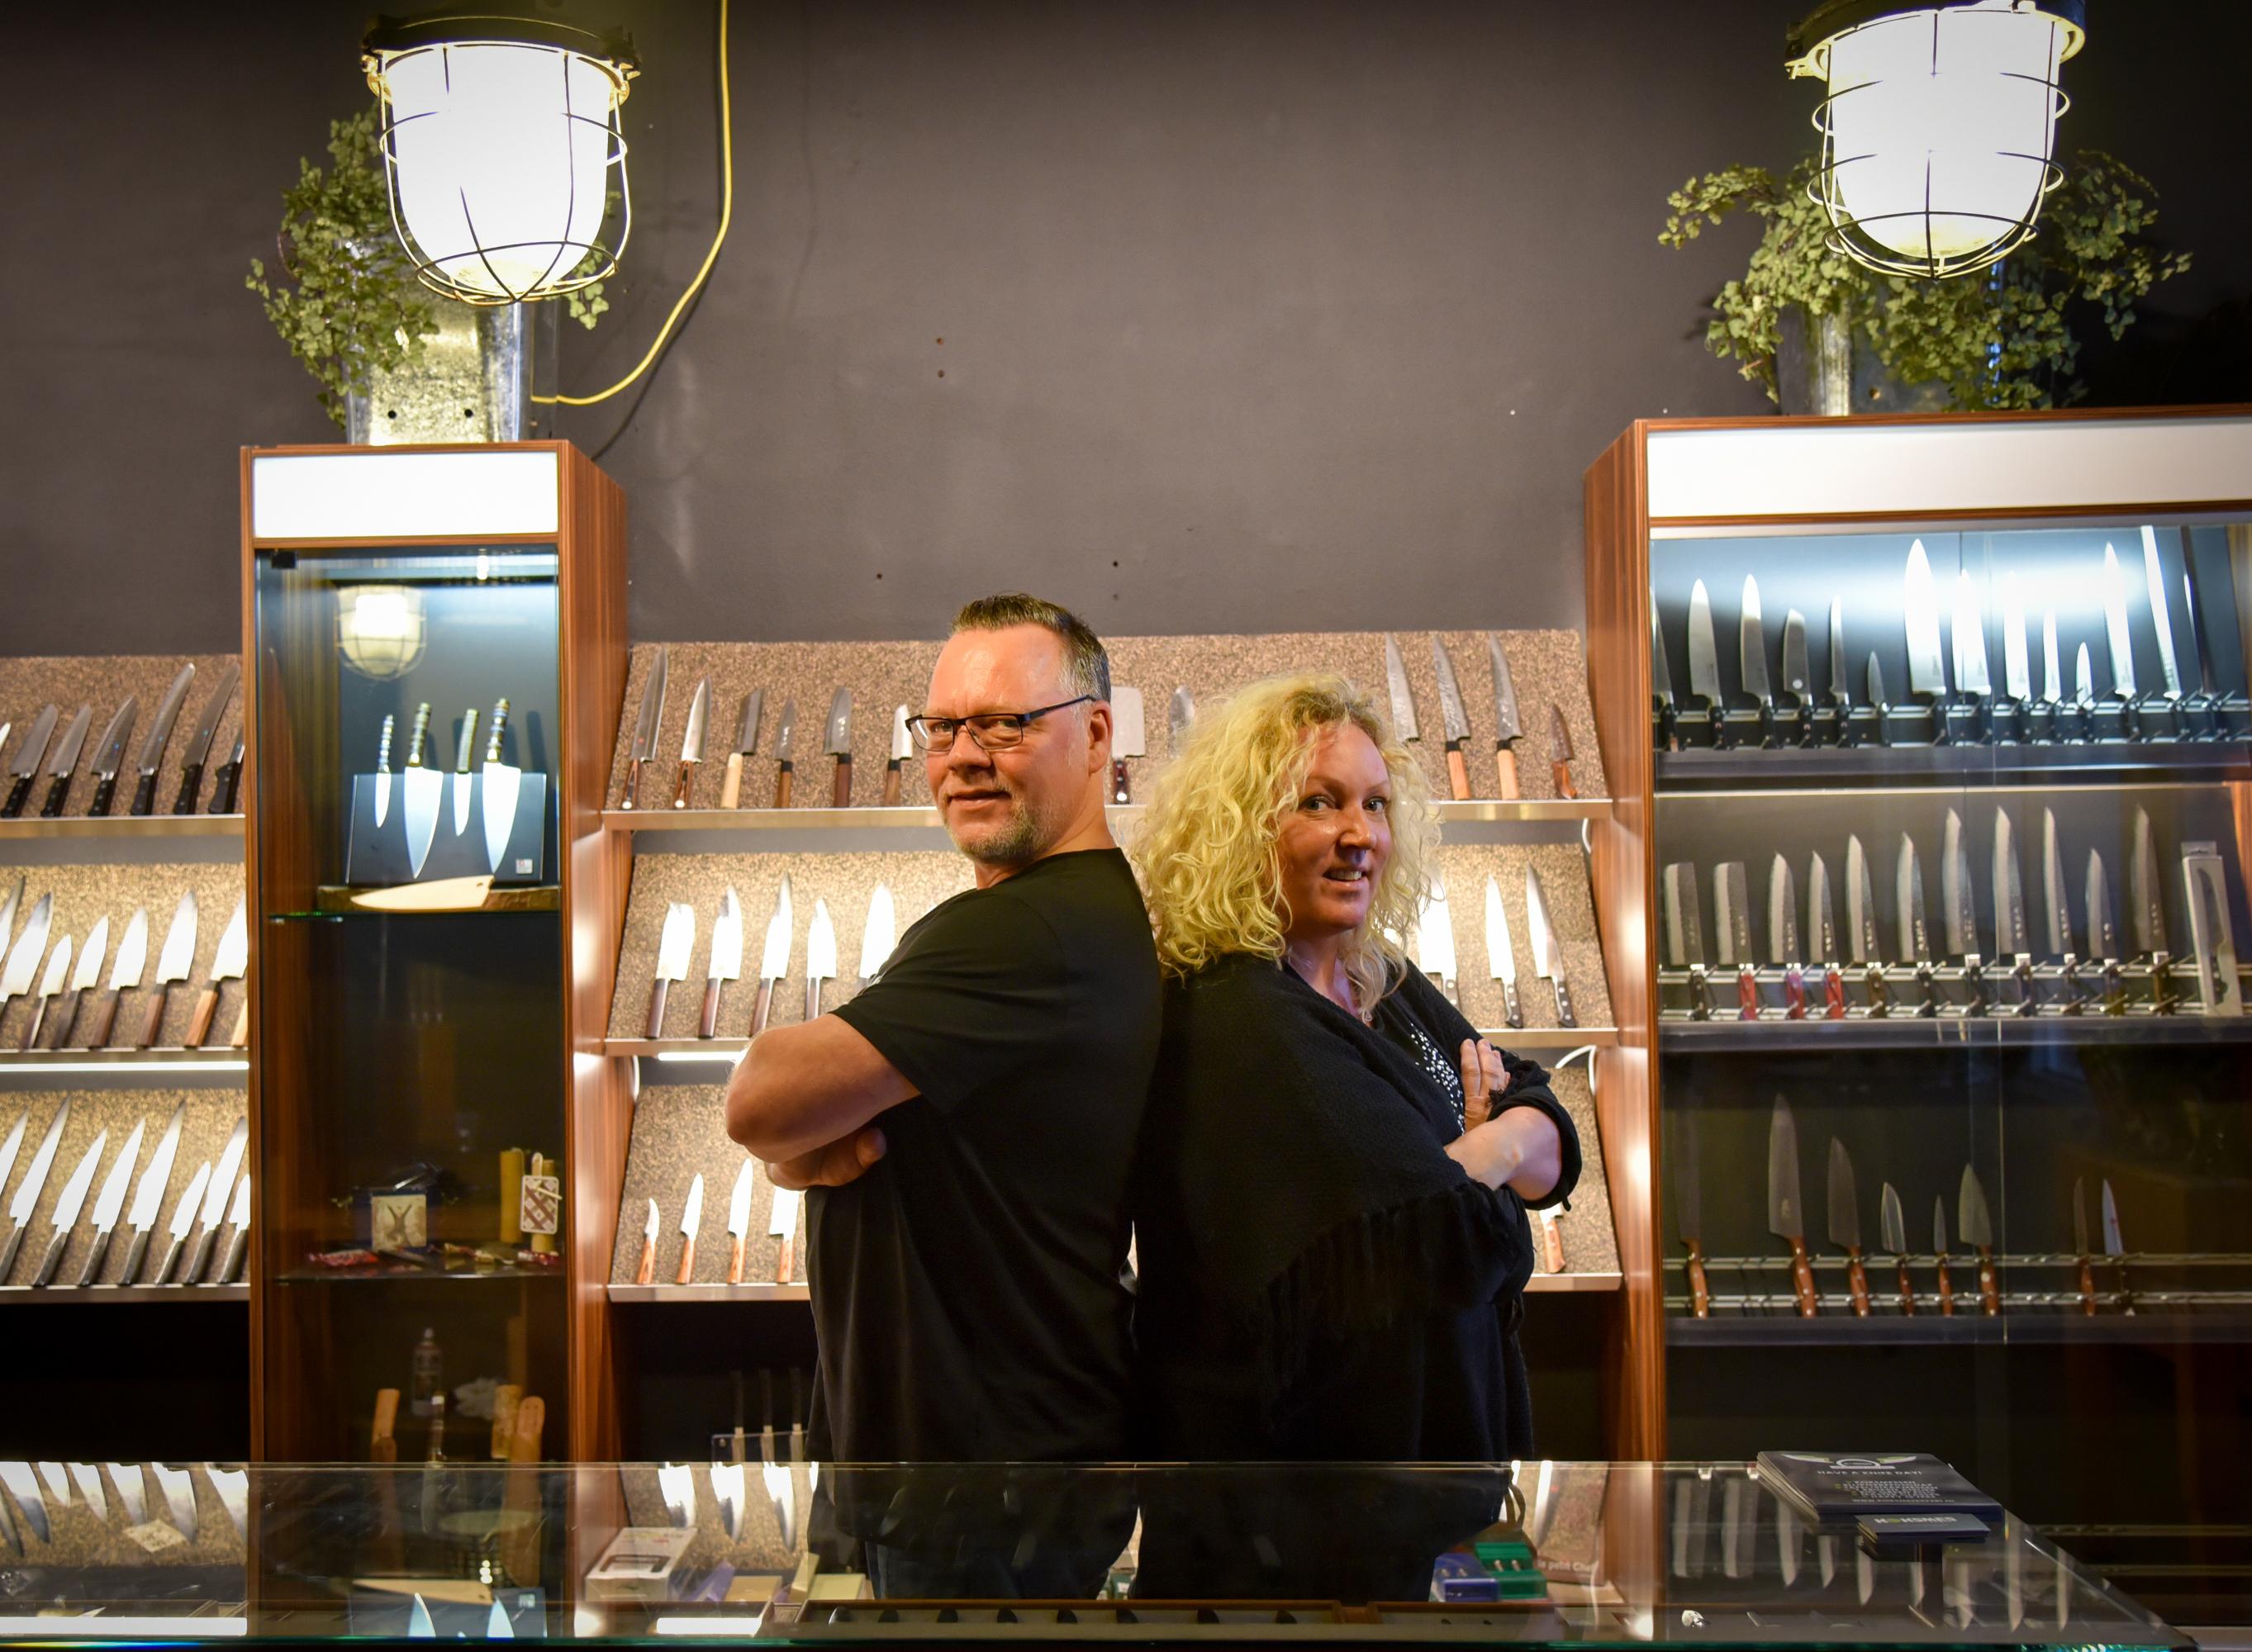 Roderick Rijsdam, Koksmes expert, food love stories